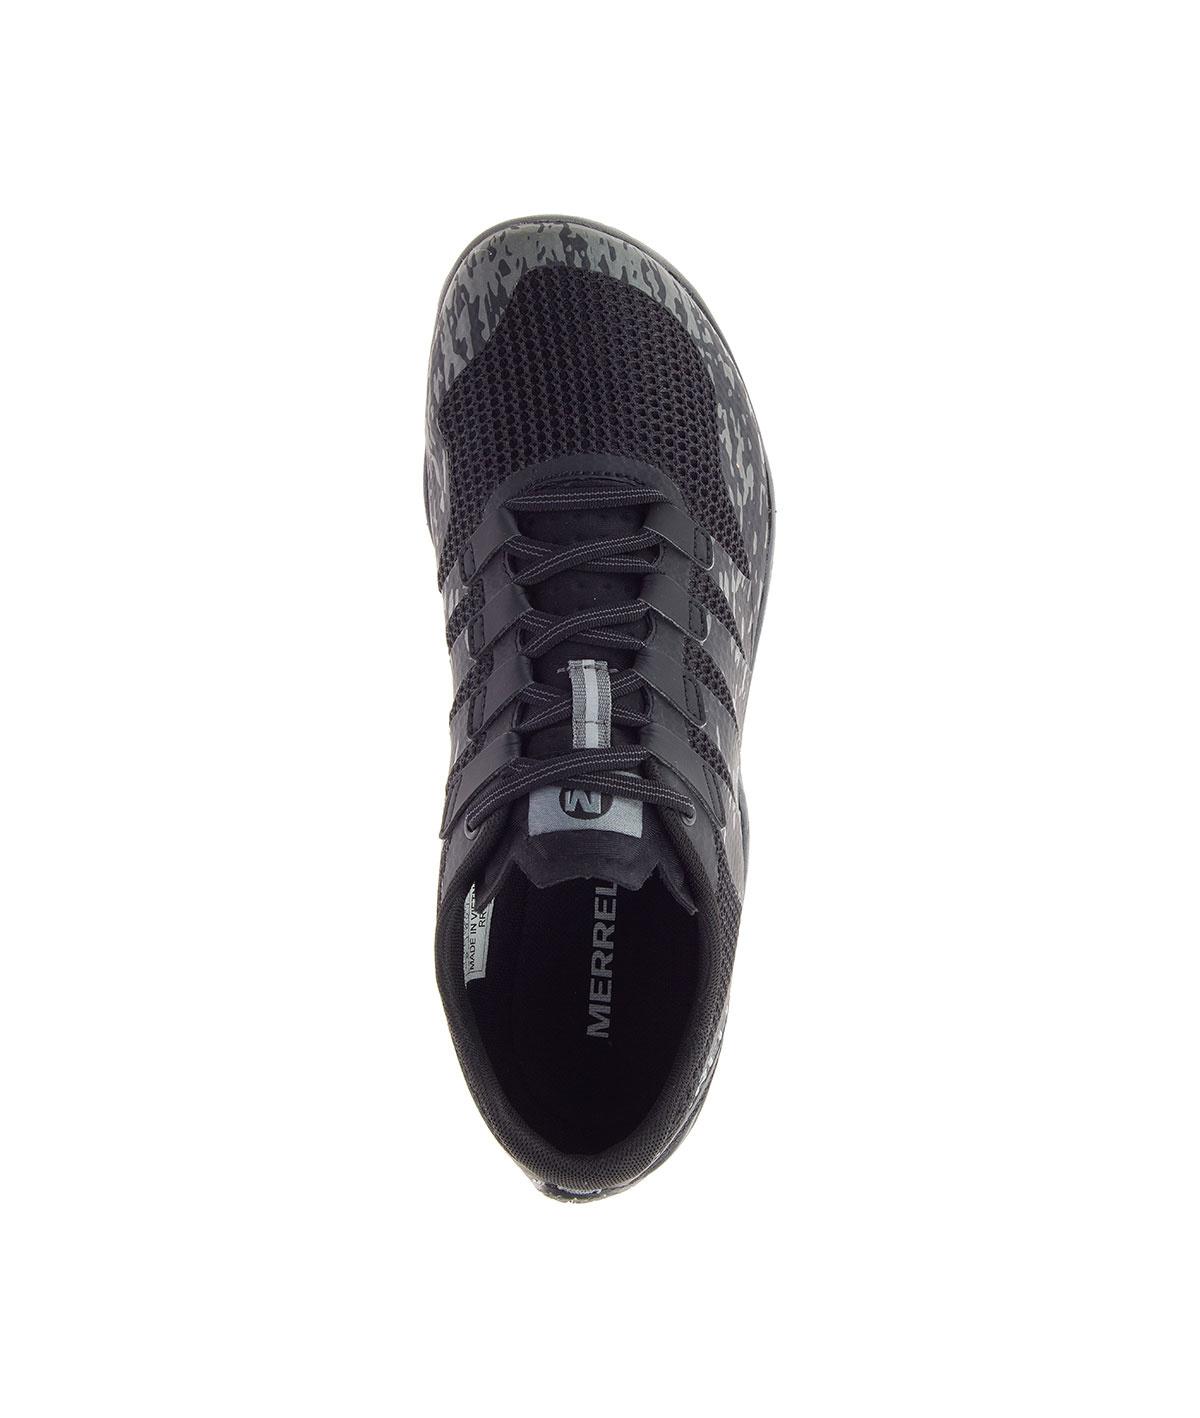 Merrell trail glove 5 black j 50293